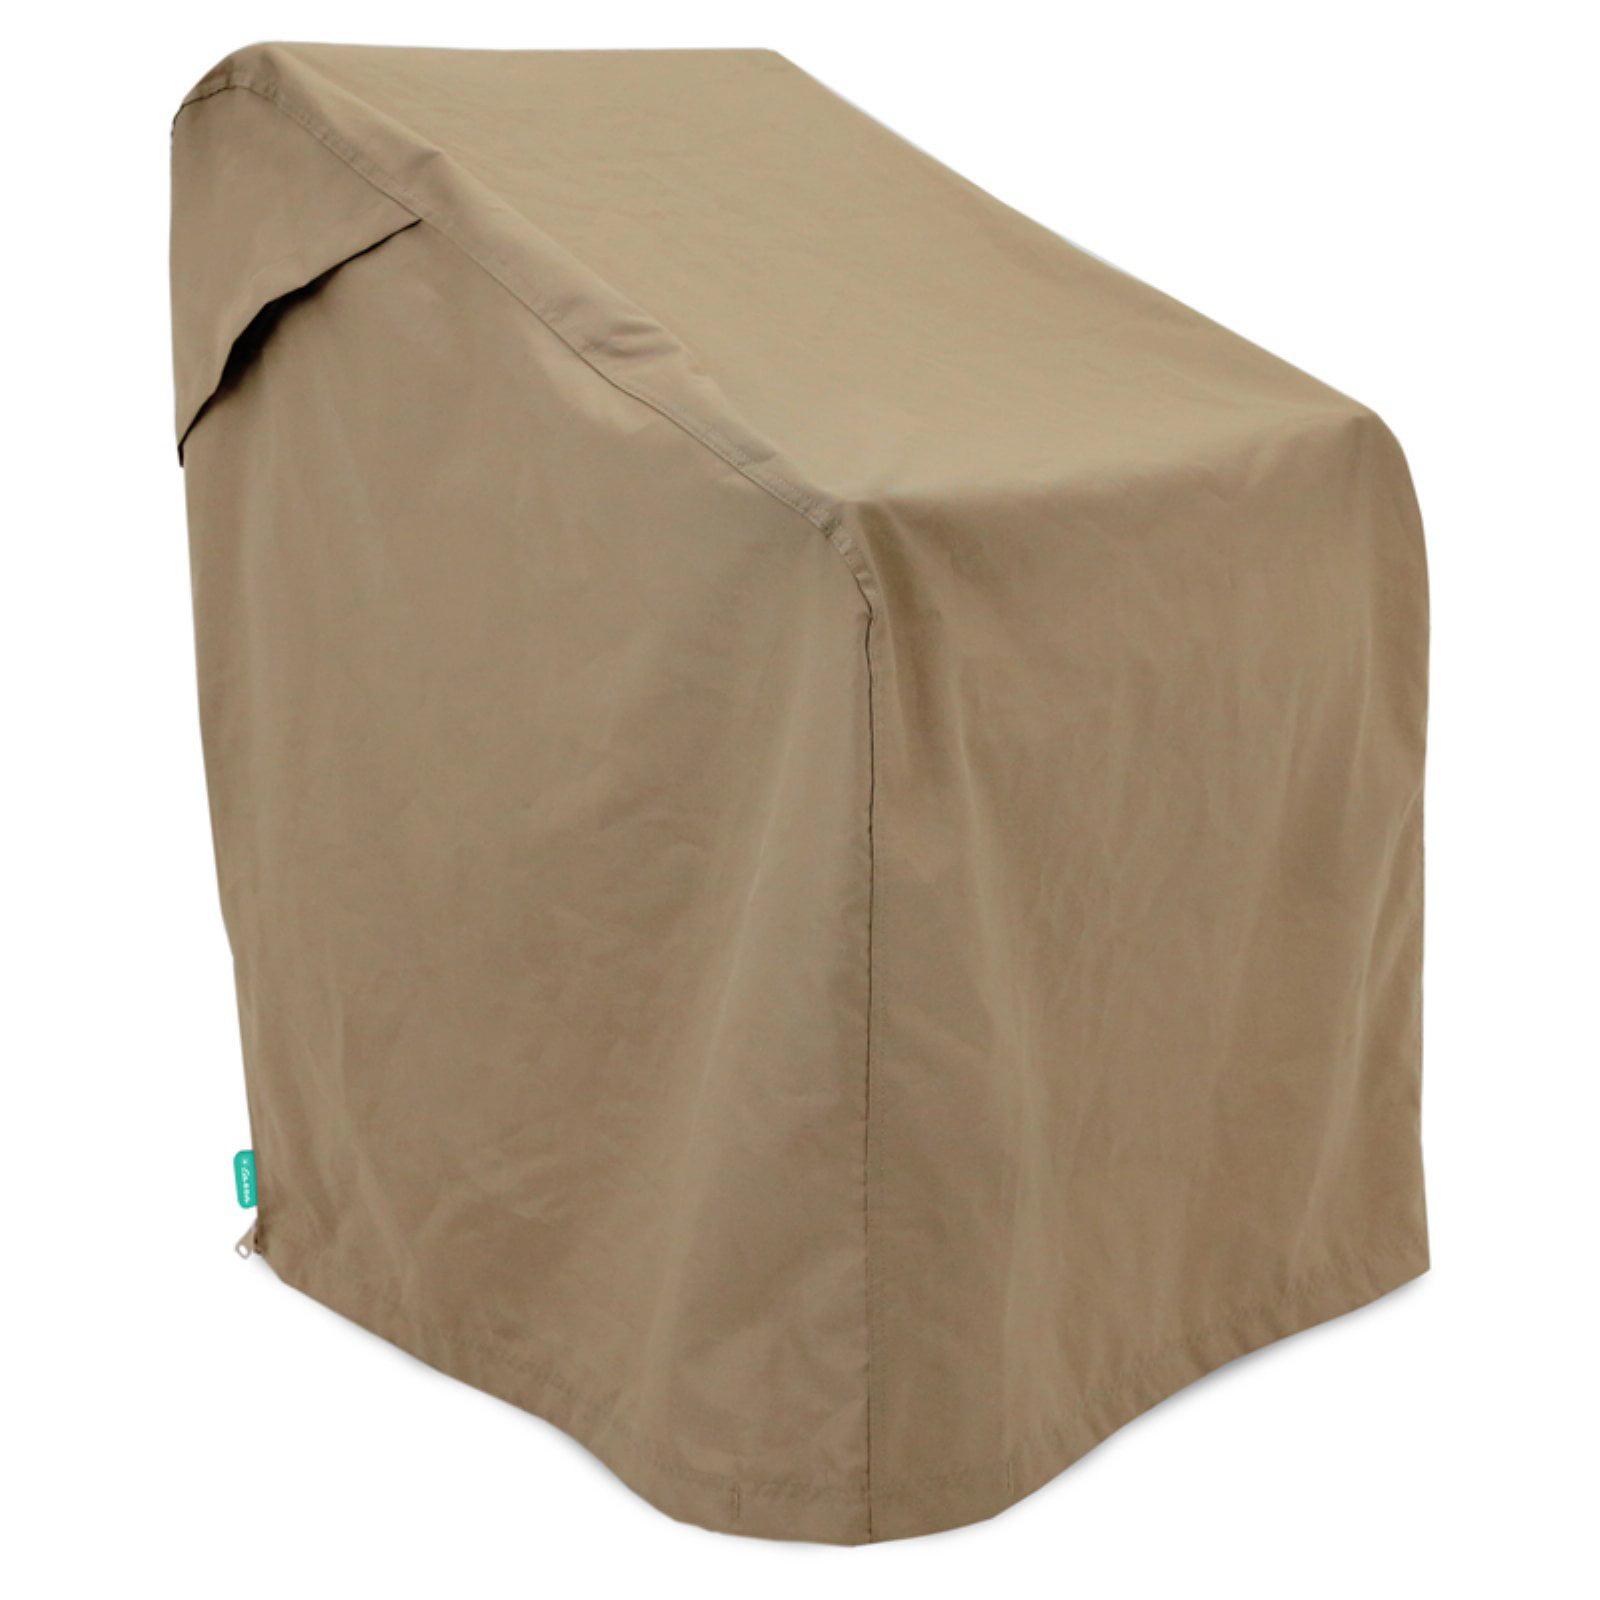 Tarra Home Universal Outdoor UFCCP363532PT Patio Chair Cover